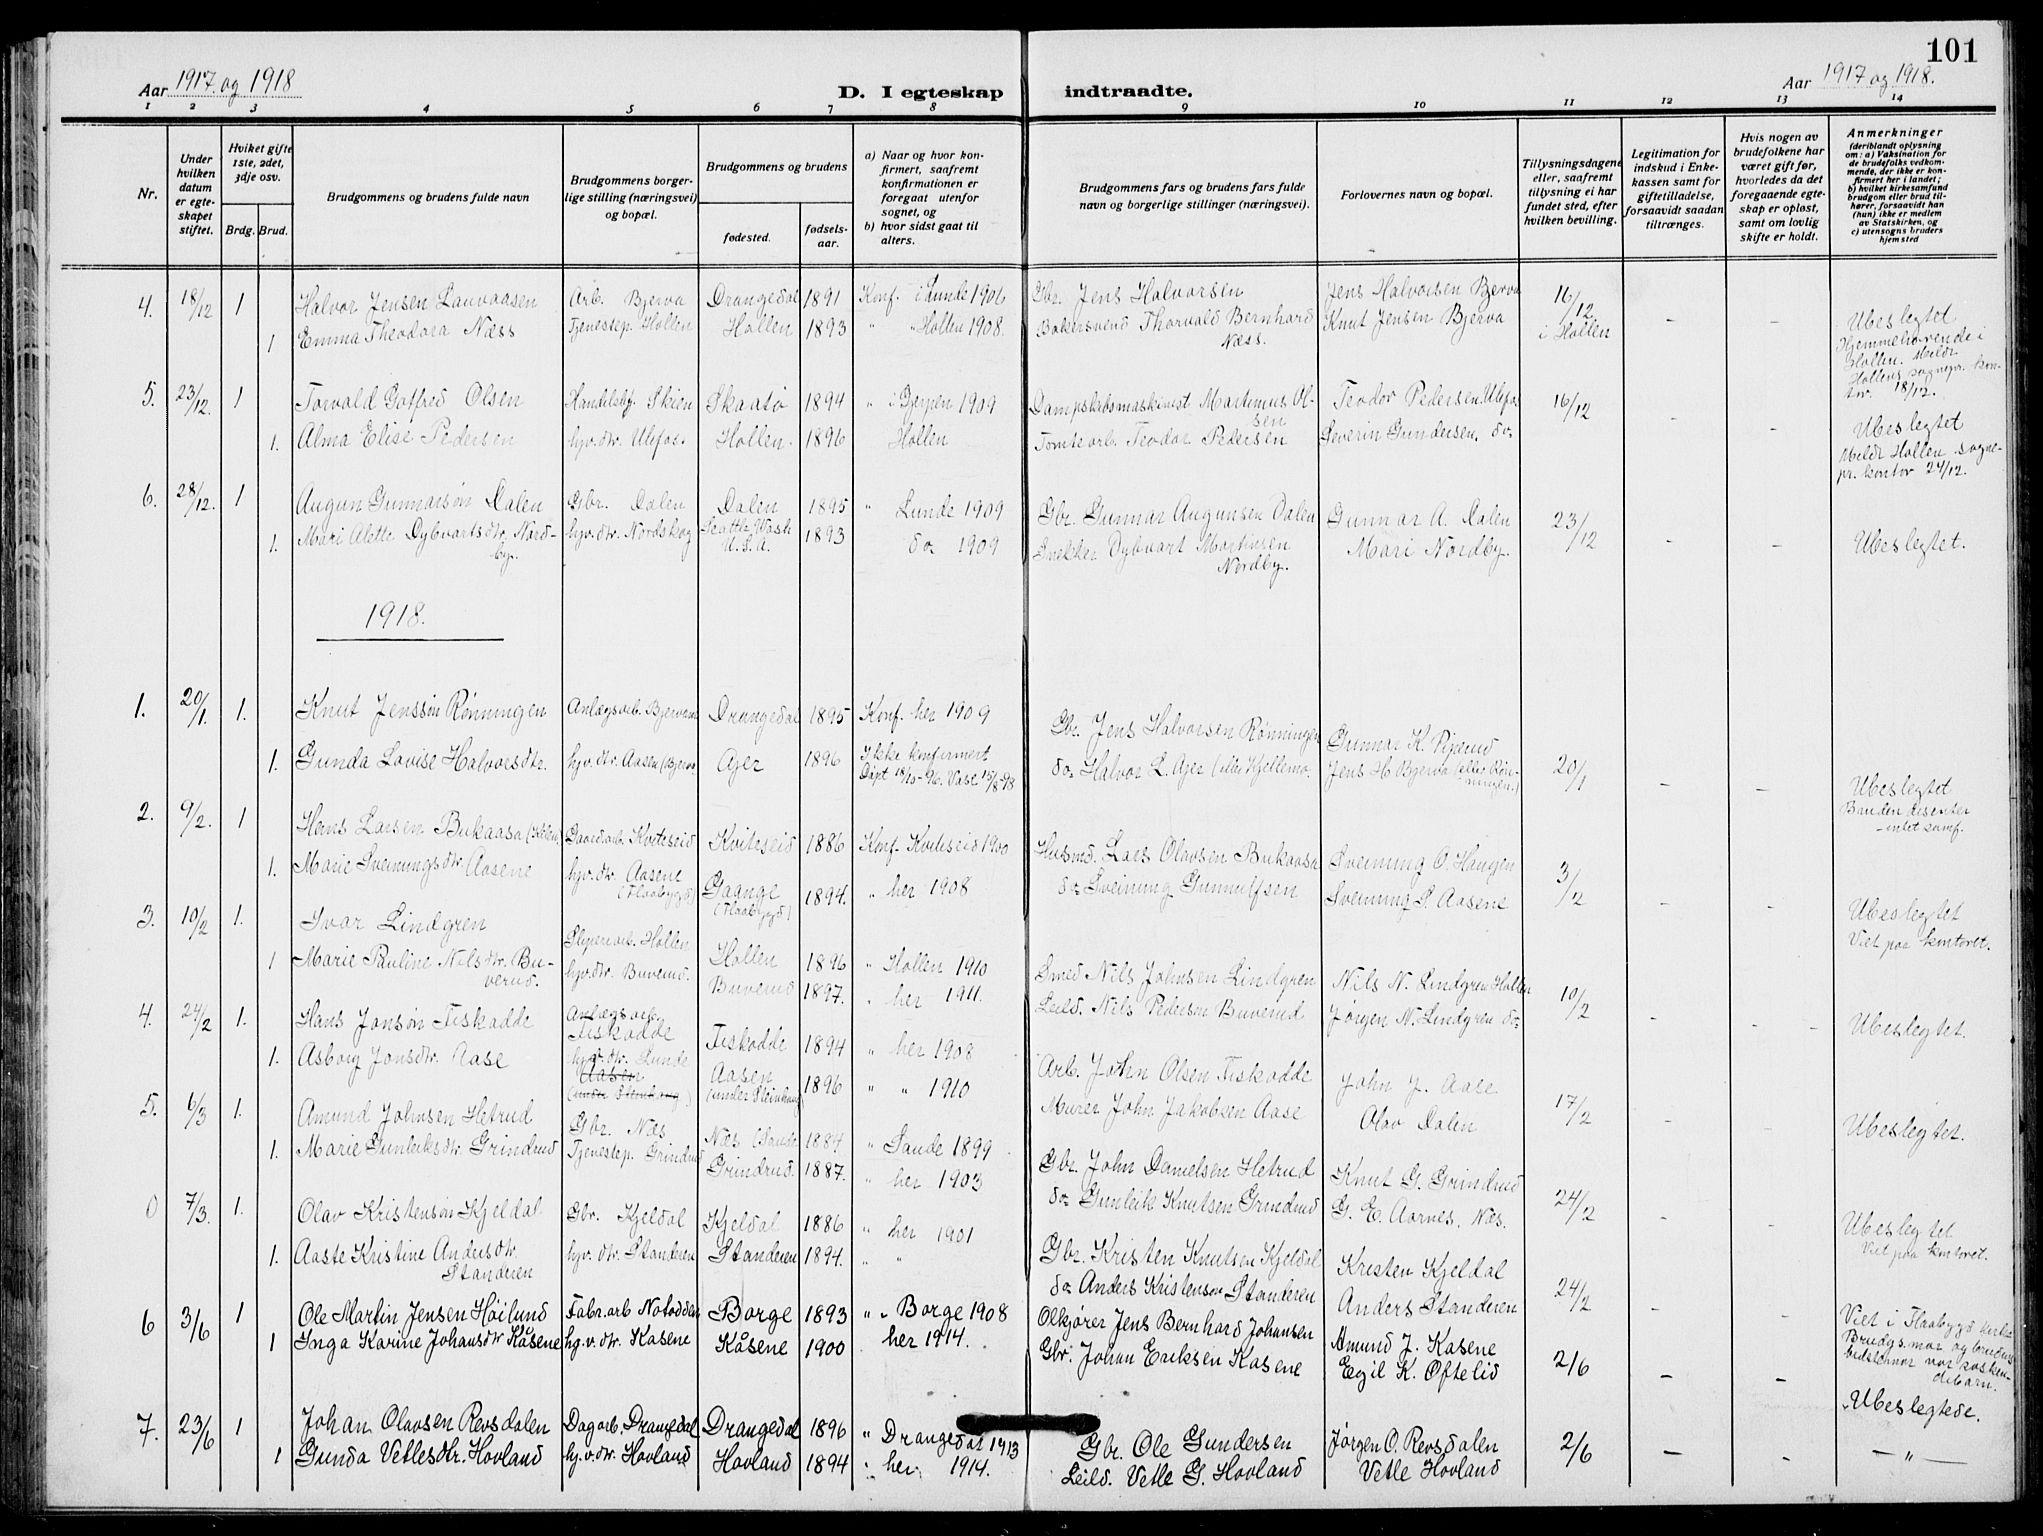 SAKO, Lunde kirkebøker, F/Fa/L0005: Ministerialbok nr. I 5, 1914-1922, s. 101